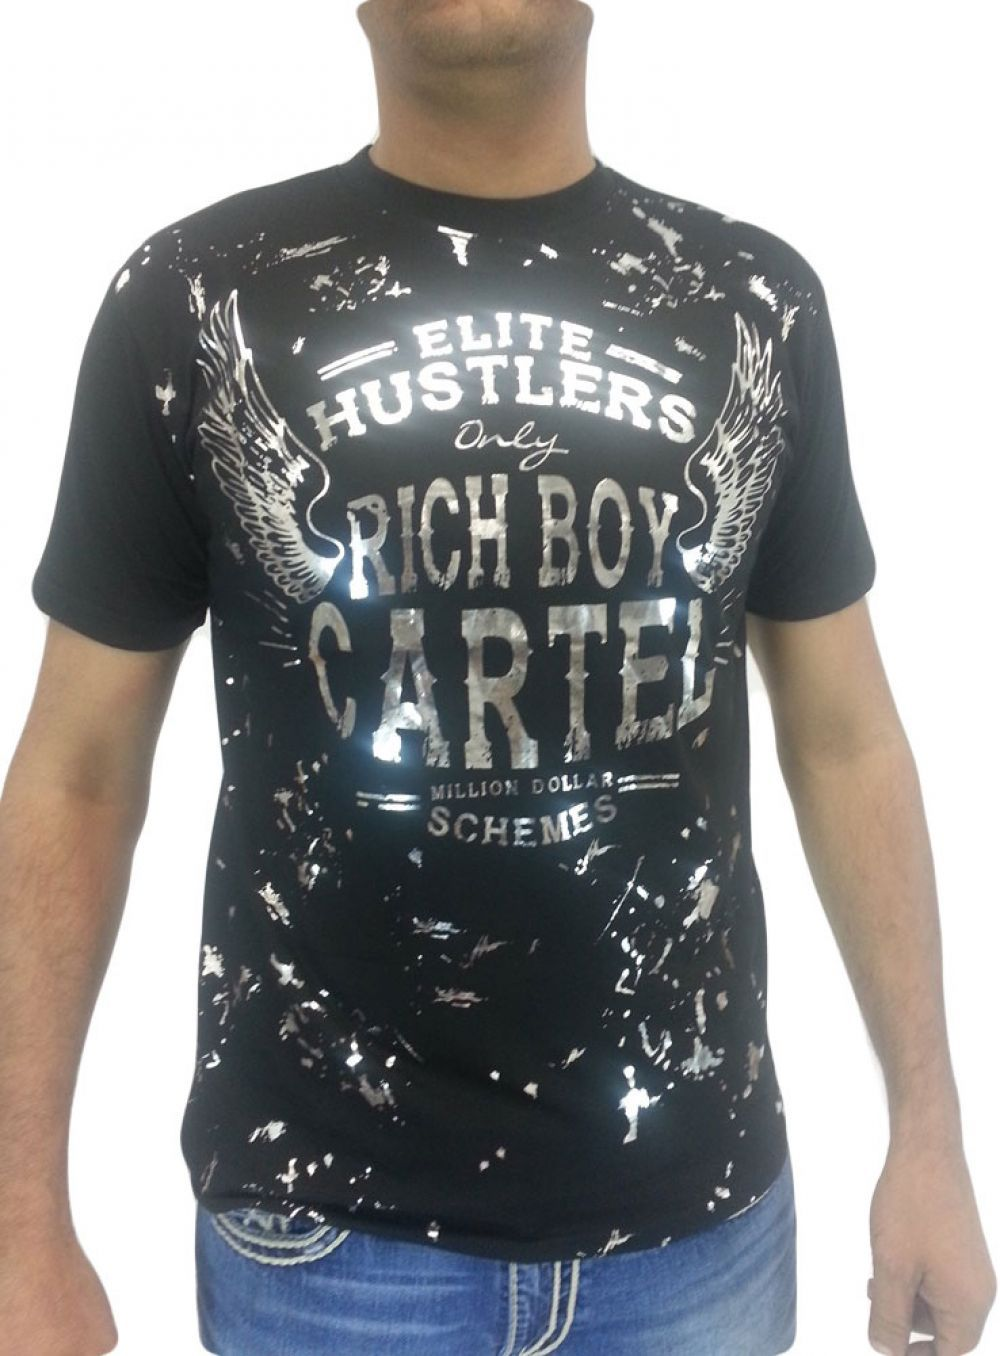 Rich Boy Cartel Men's Mens Elite Hustlers Shirt- Choose ...